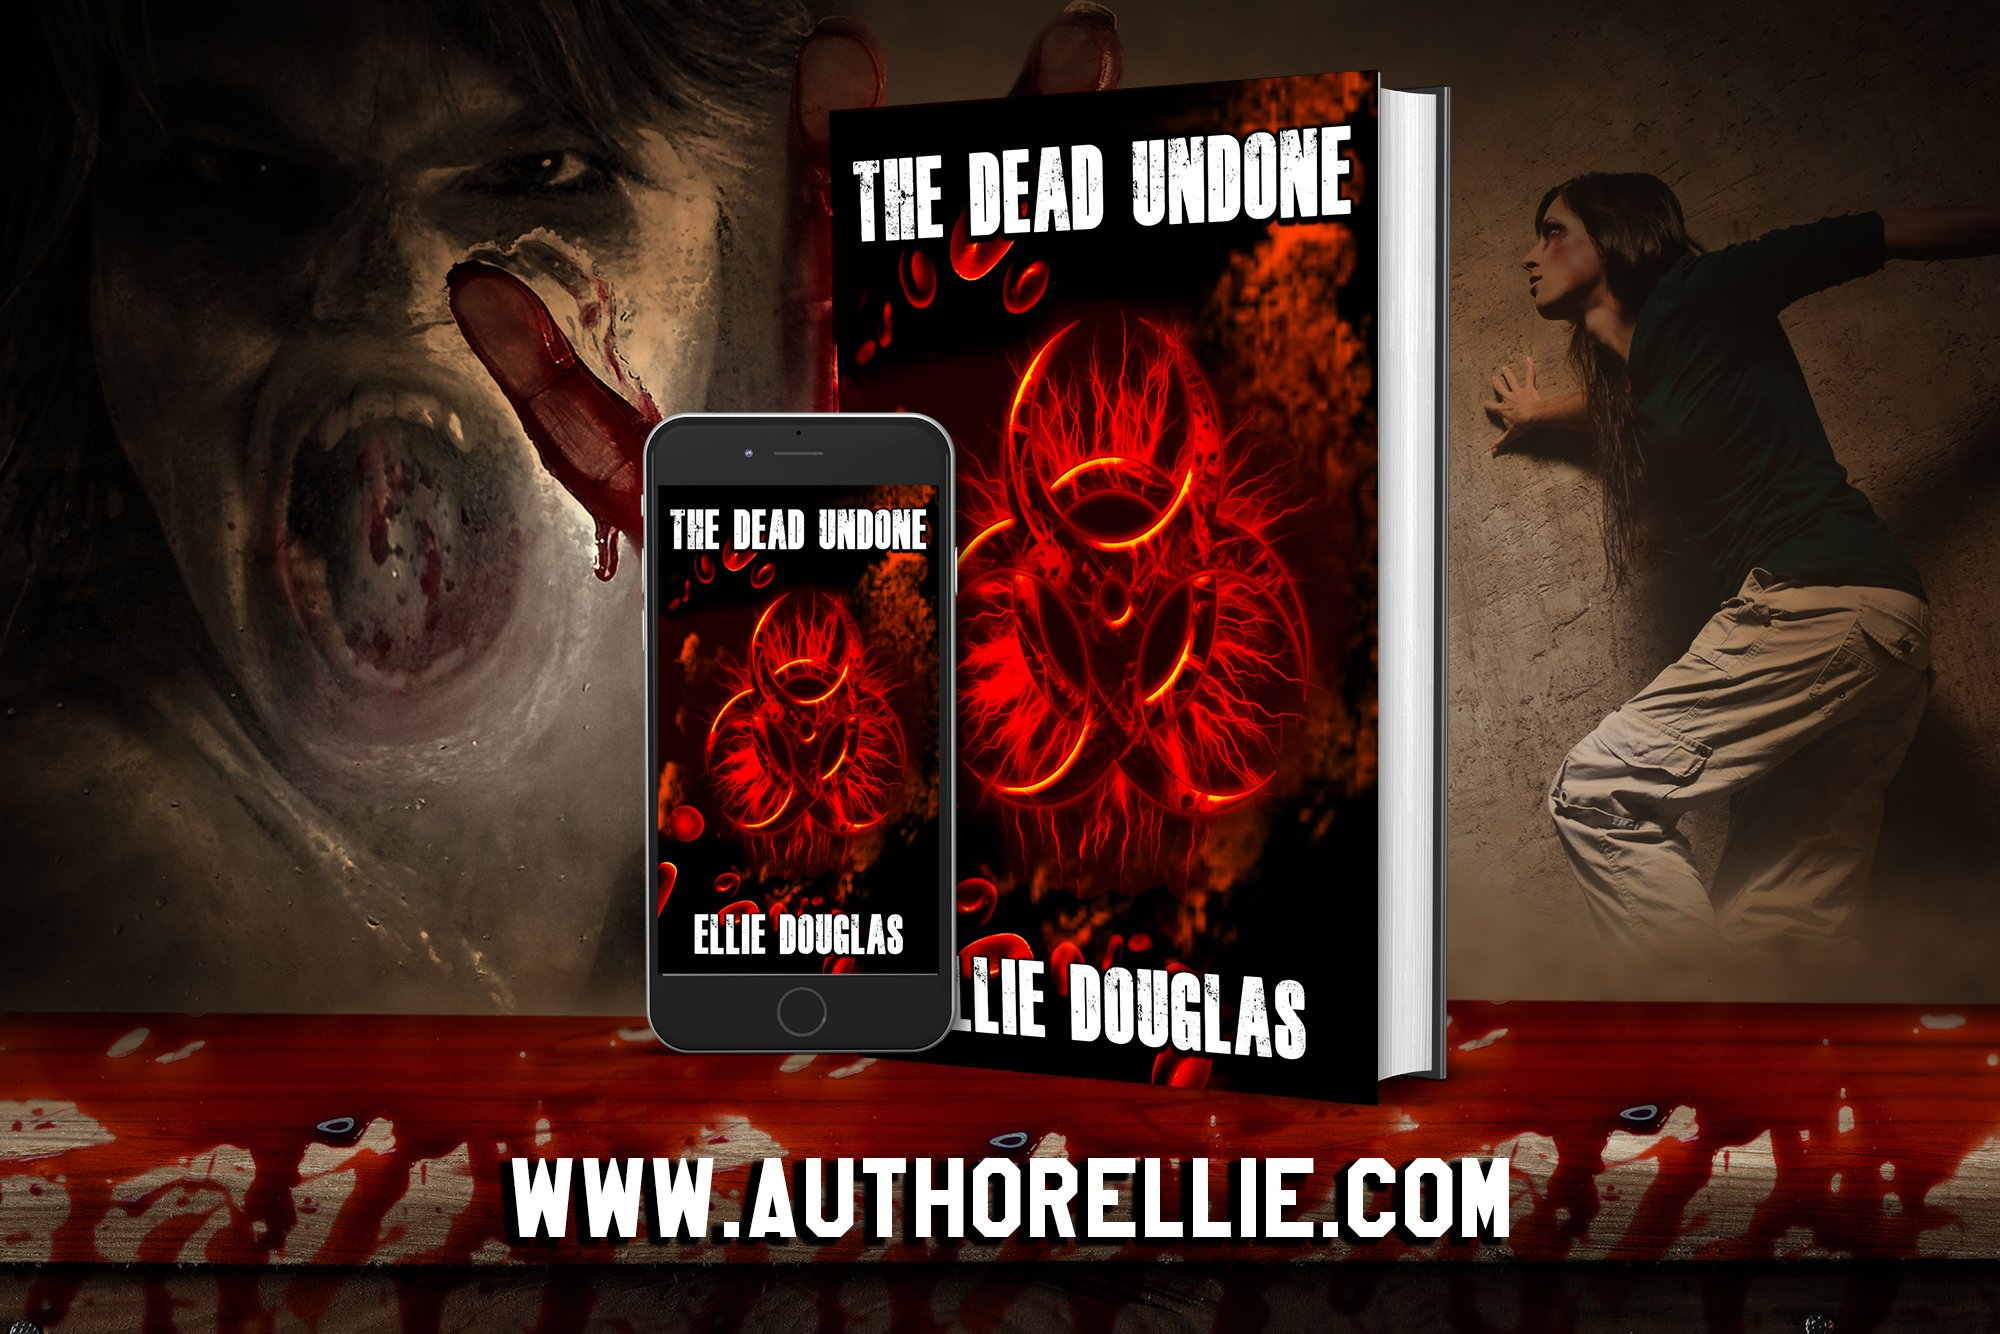 Bookcover art The Dead Undone by Ellie Douglas